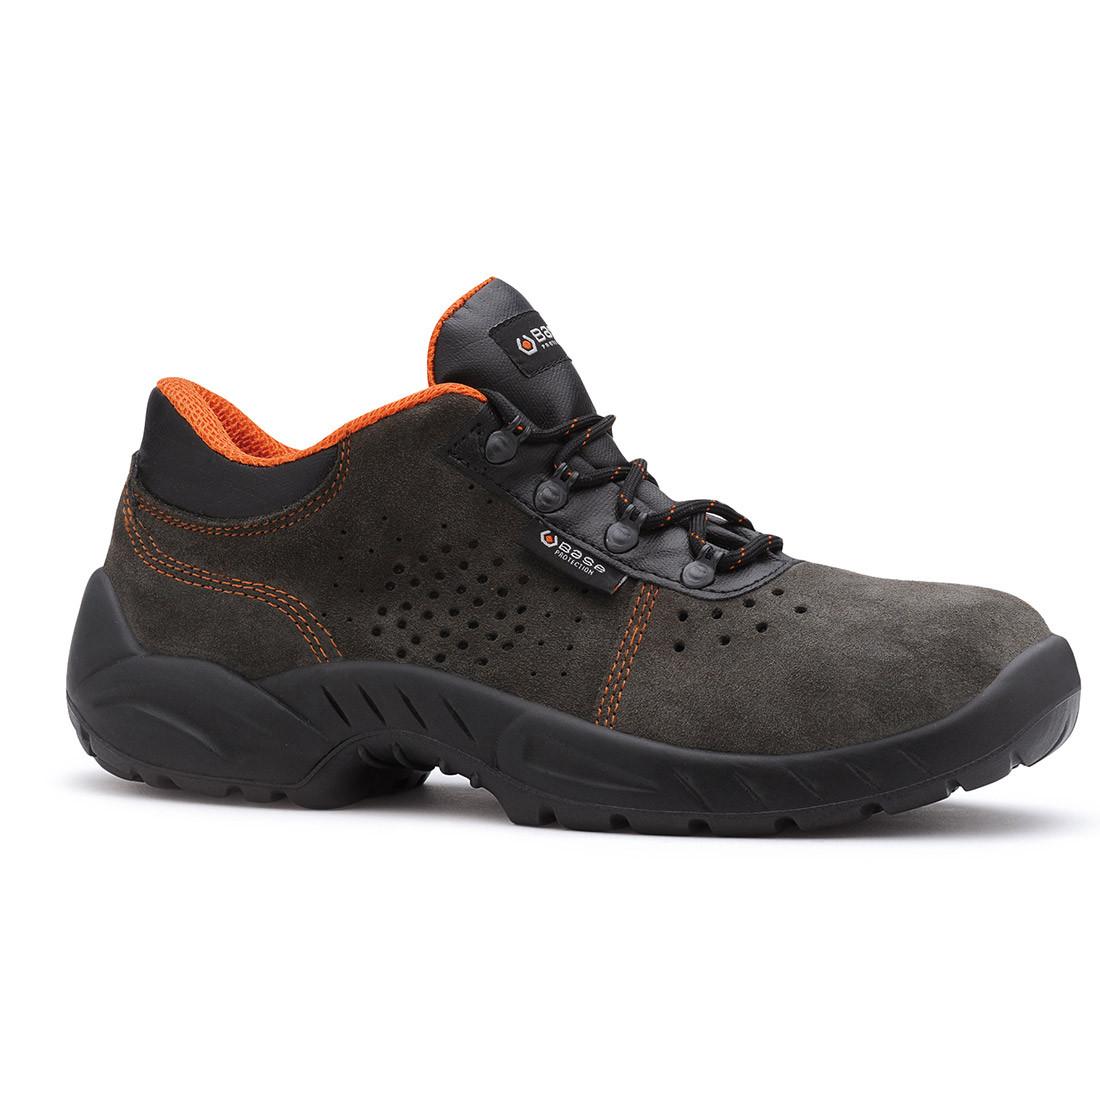 Pantofi Opera S1P SRC - Incaltaminte de protectie